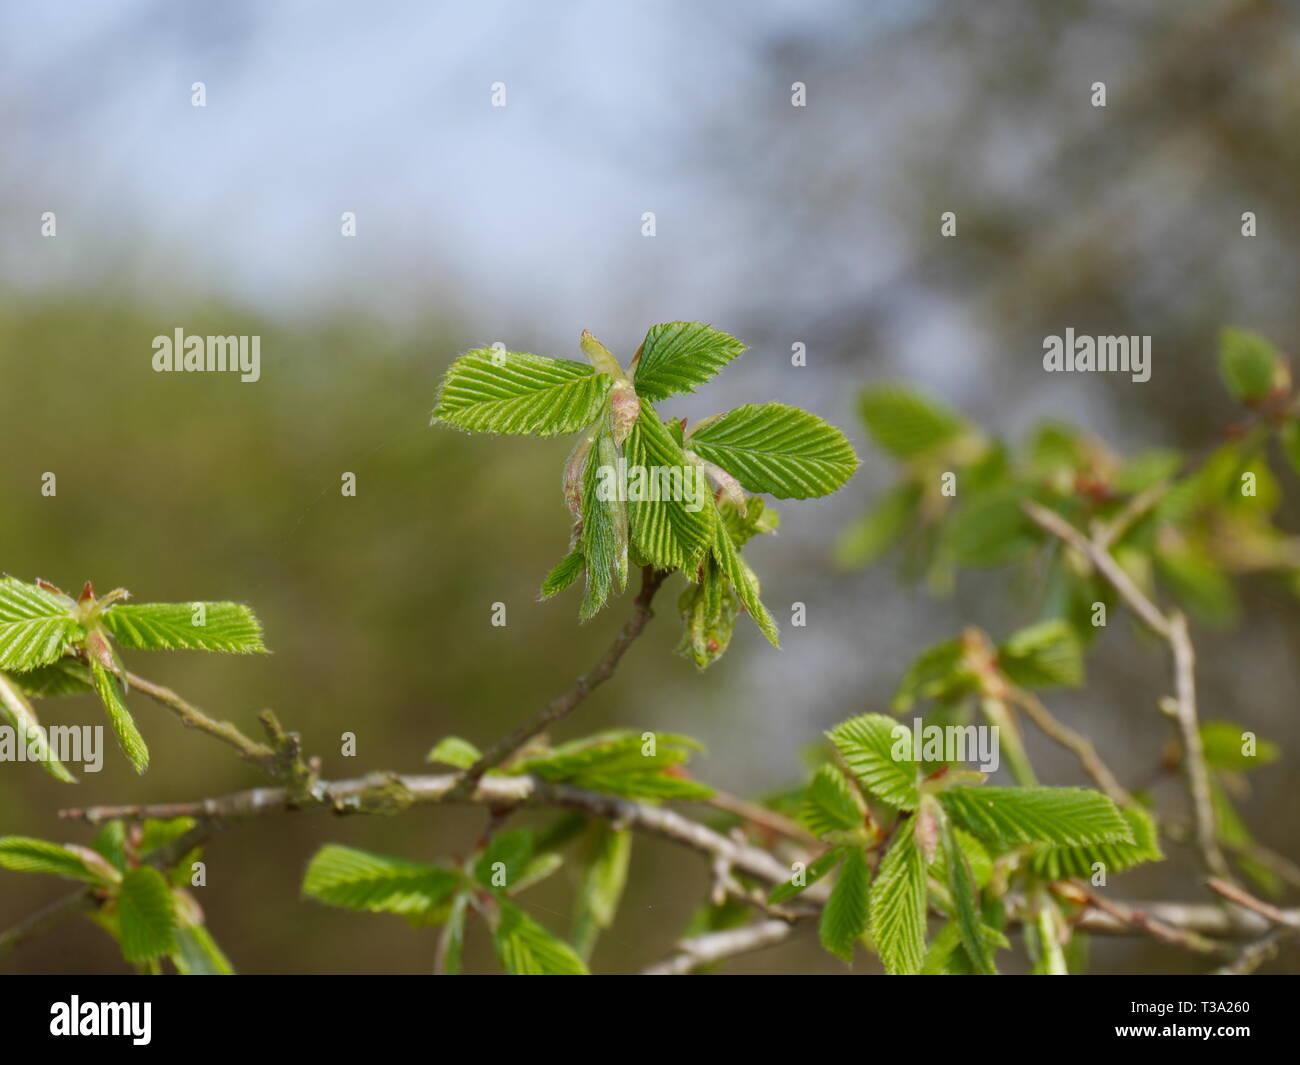 European hornbeam [Carpinus betulus] in spring time - Stock Image